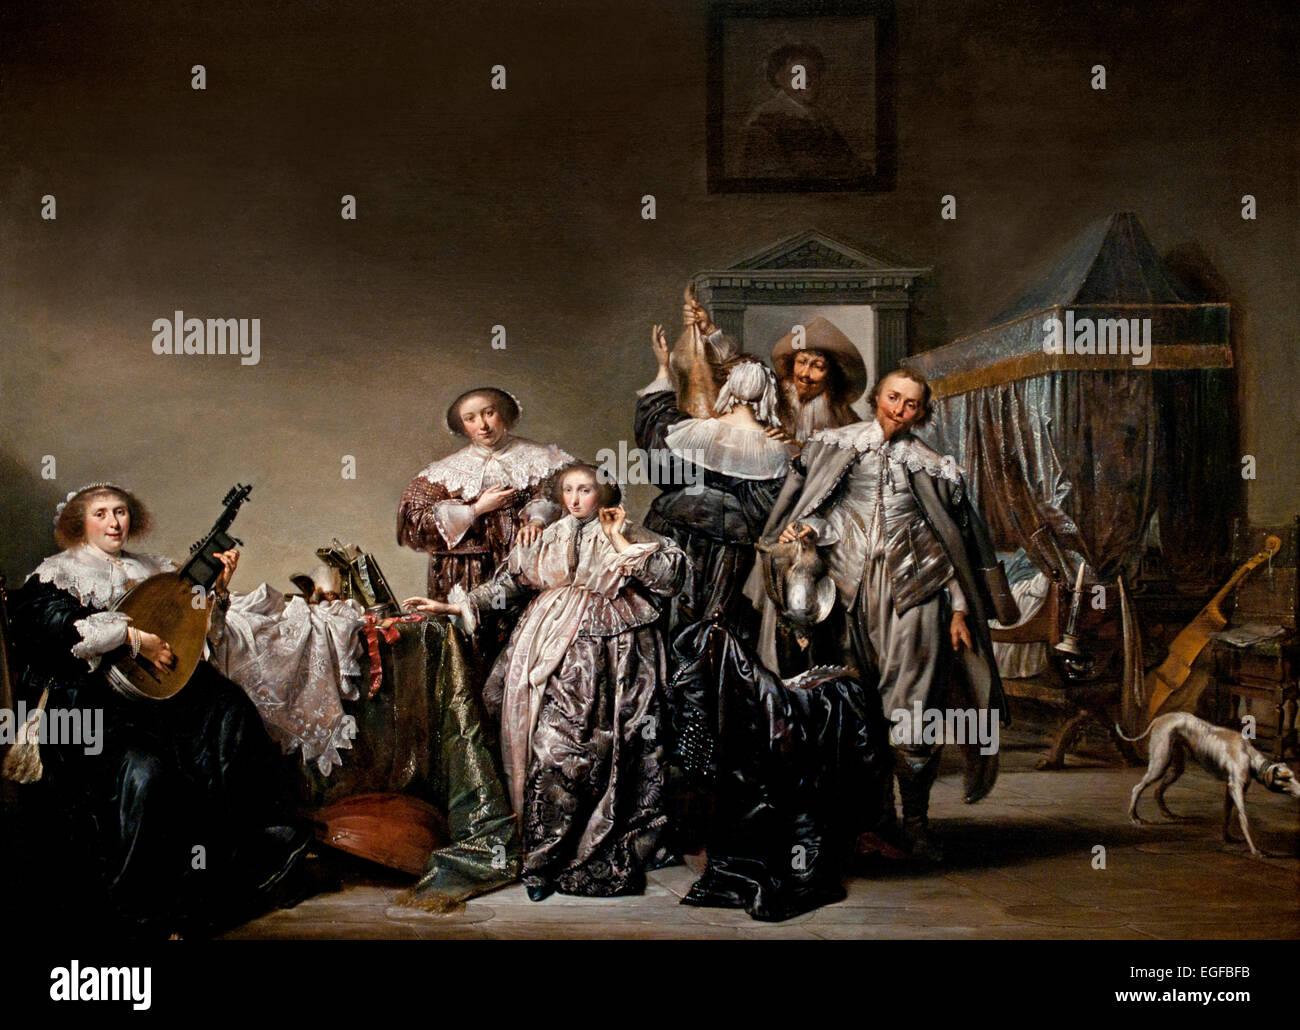 Gallant Company 1633 Pieter Codde 1599-1678  Dutch Netherlands - Stock Image